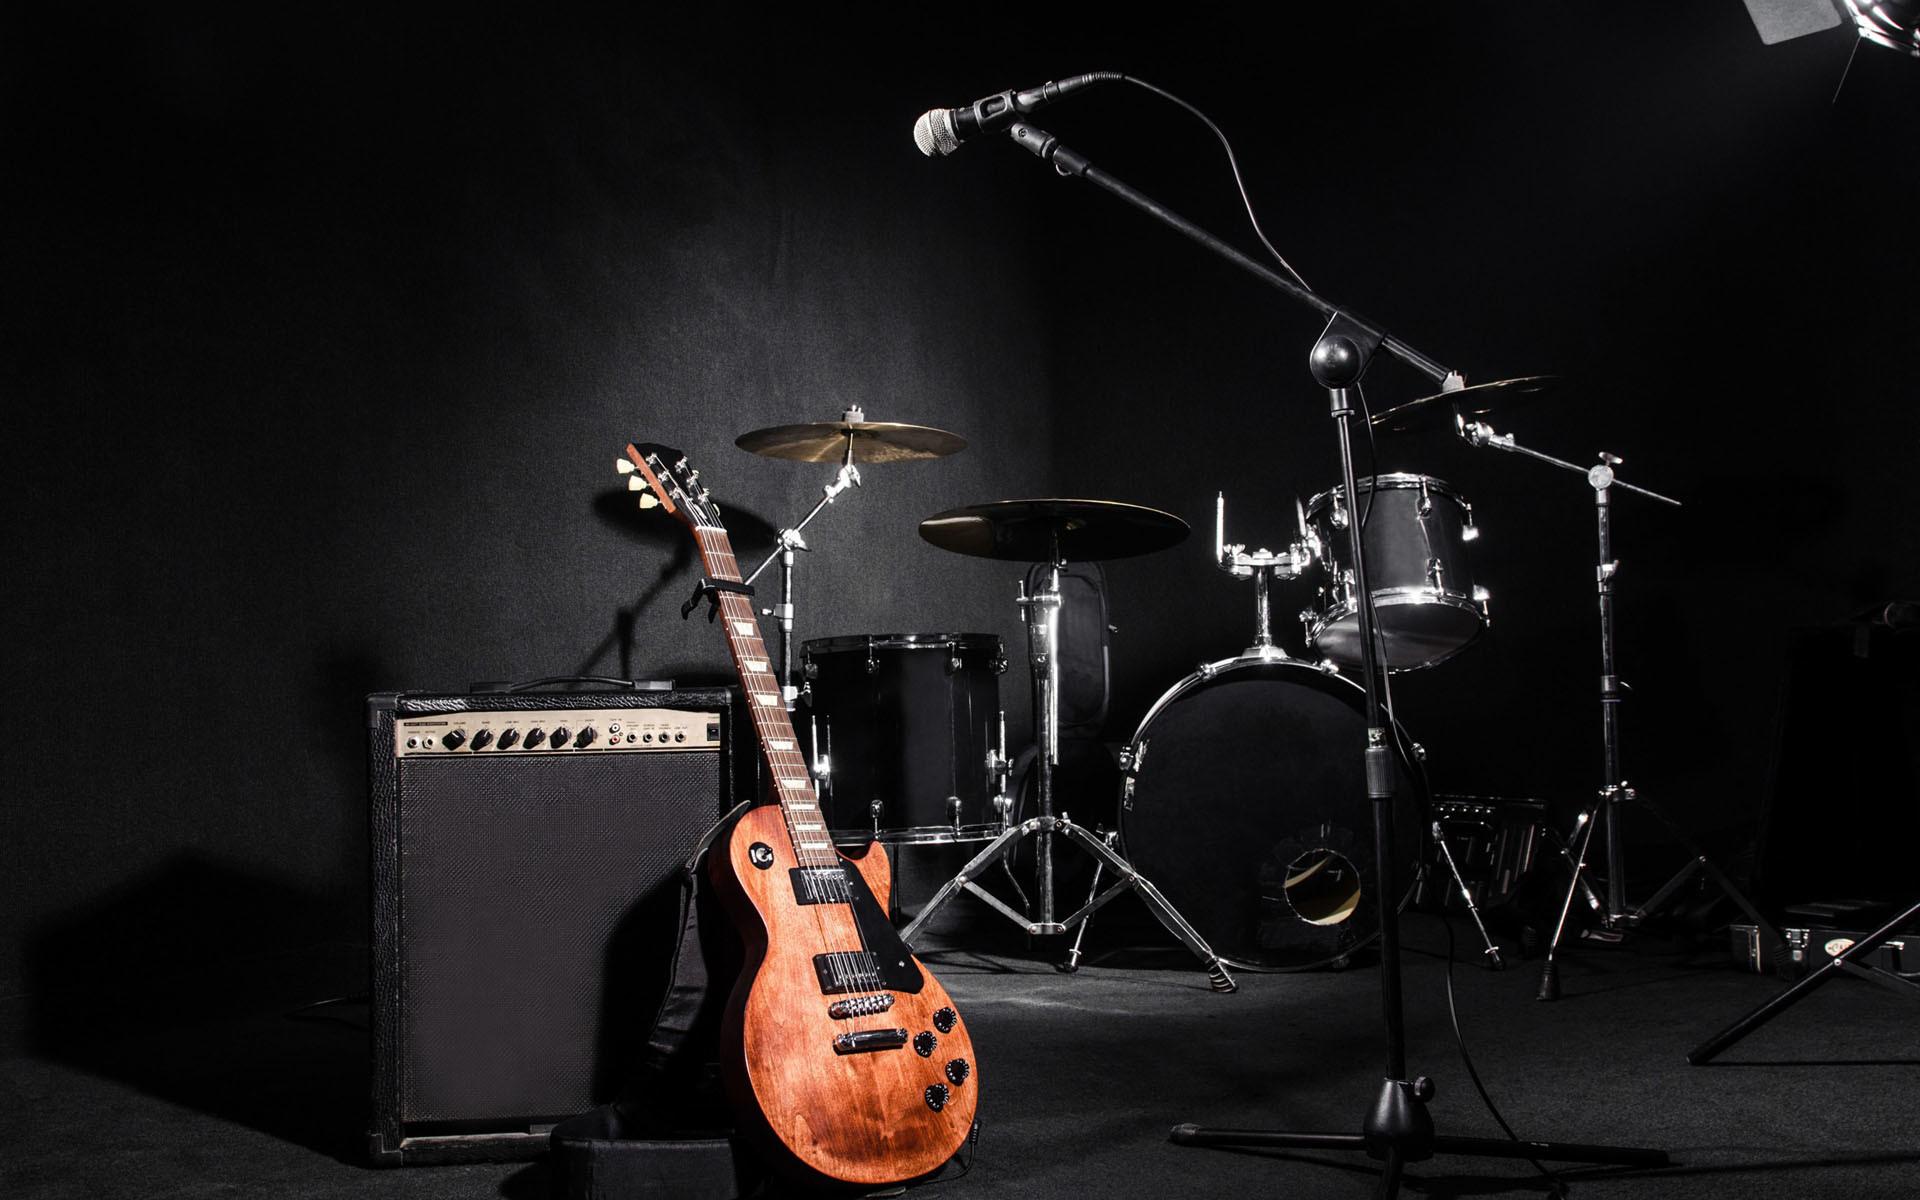 Taylor Guitar Wallpaper (59+ images)